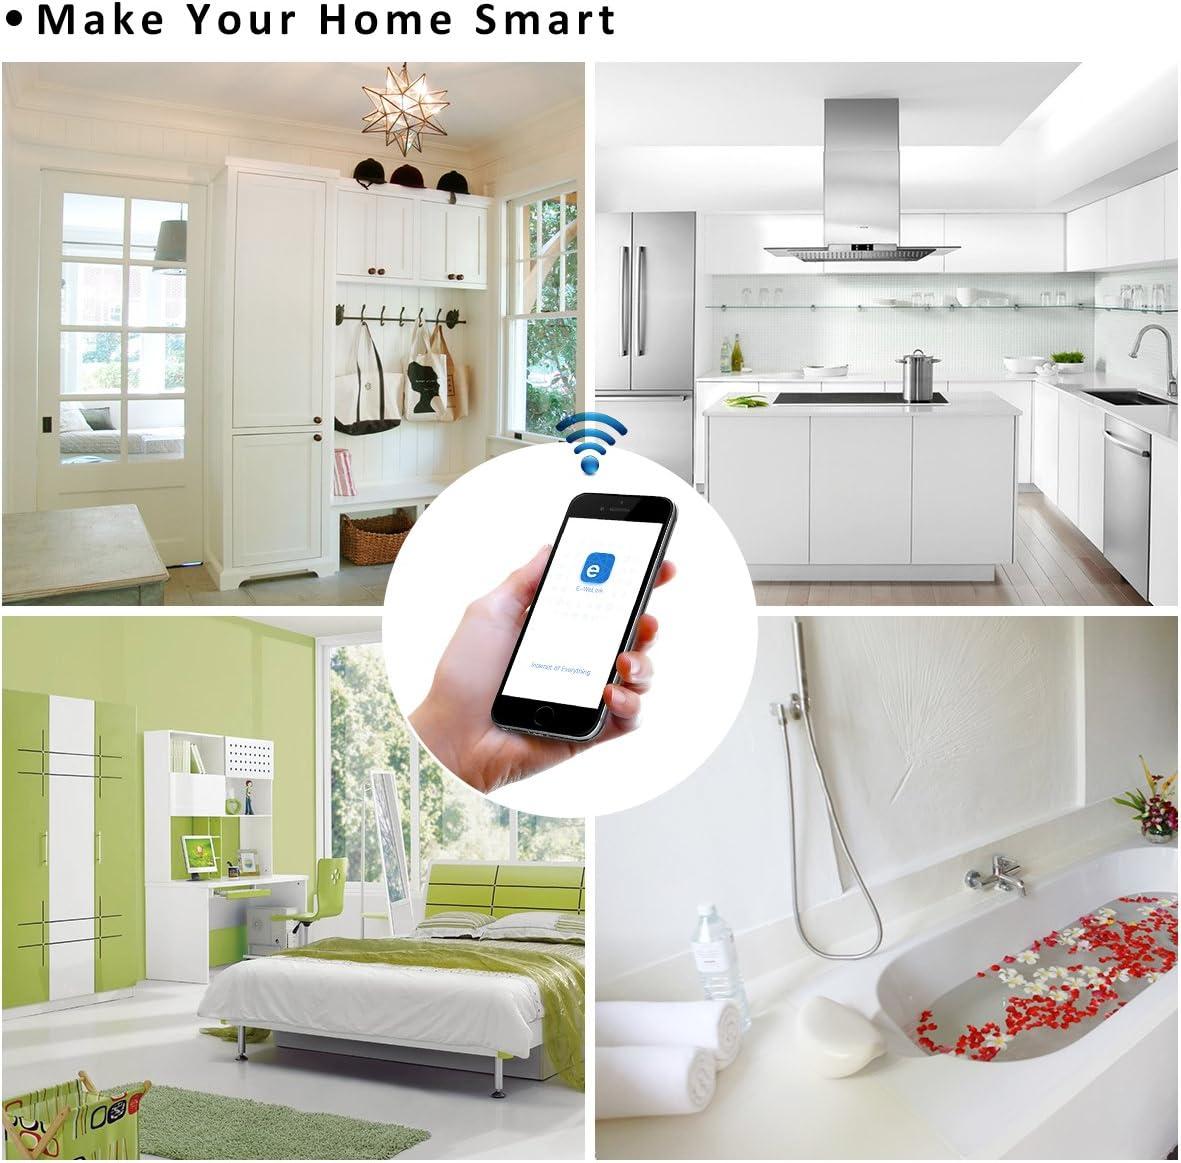 4CH Pro R3 Interruptor Inteligente WiFi Smart Switch Inal/ámbrico Conmutador con Autobloqueo//Enclavamiento//Intermitente 0,5-3600s Google Assistant Nest IFTTT para  Alexa Elettroscopio